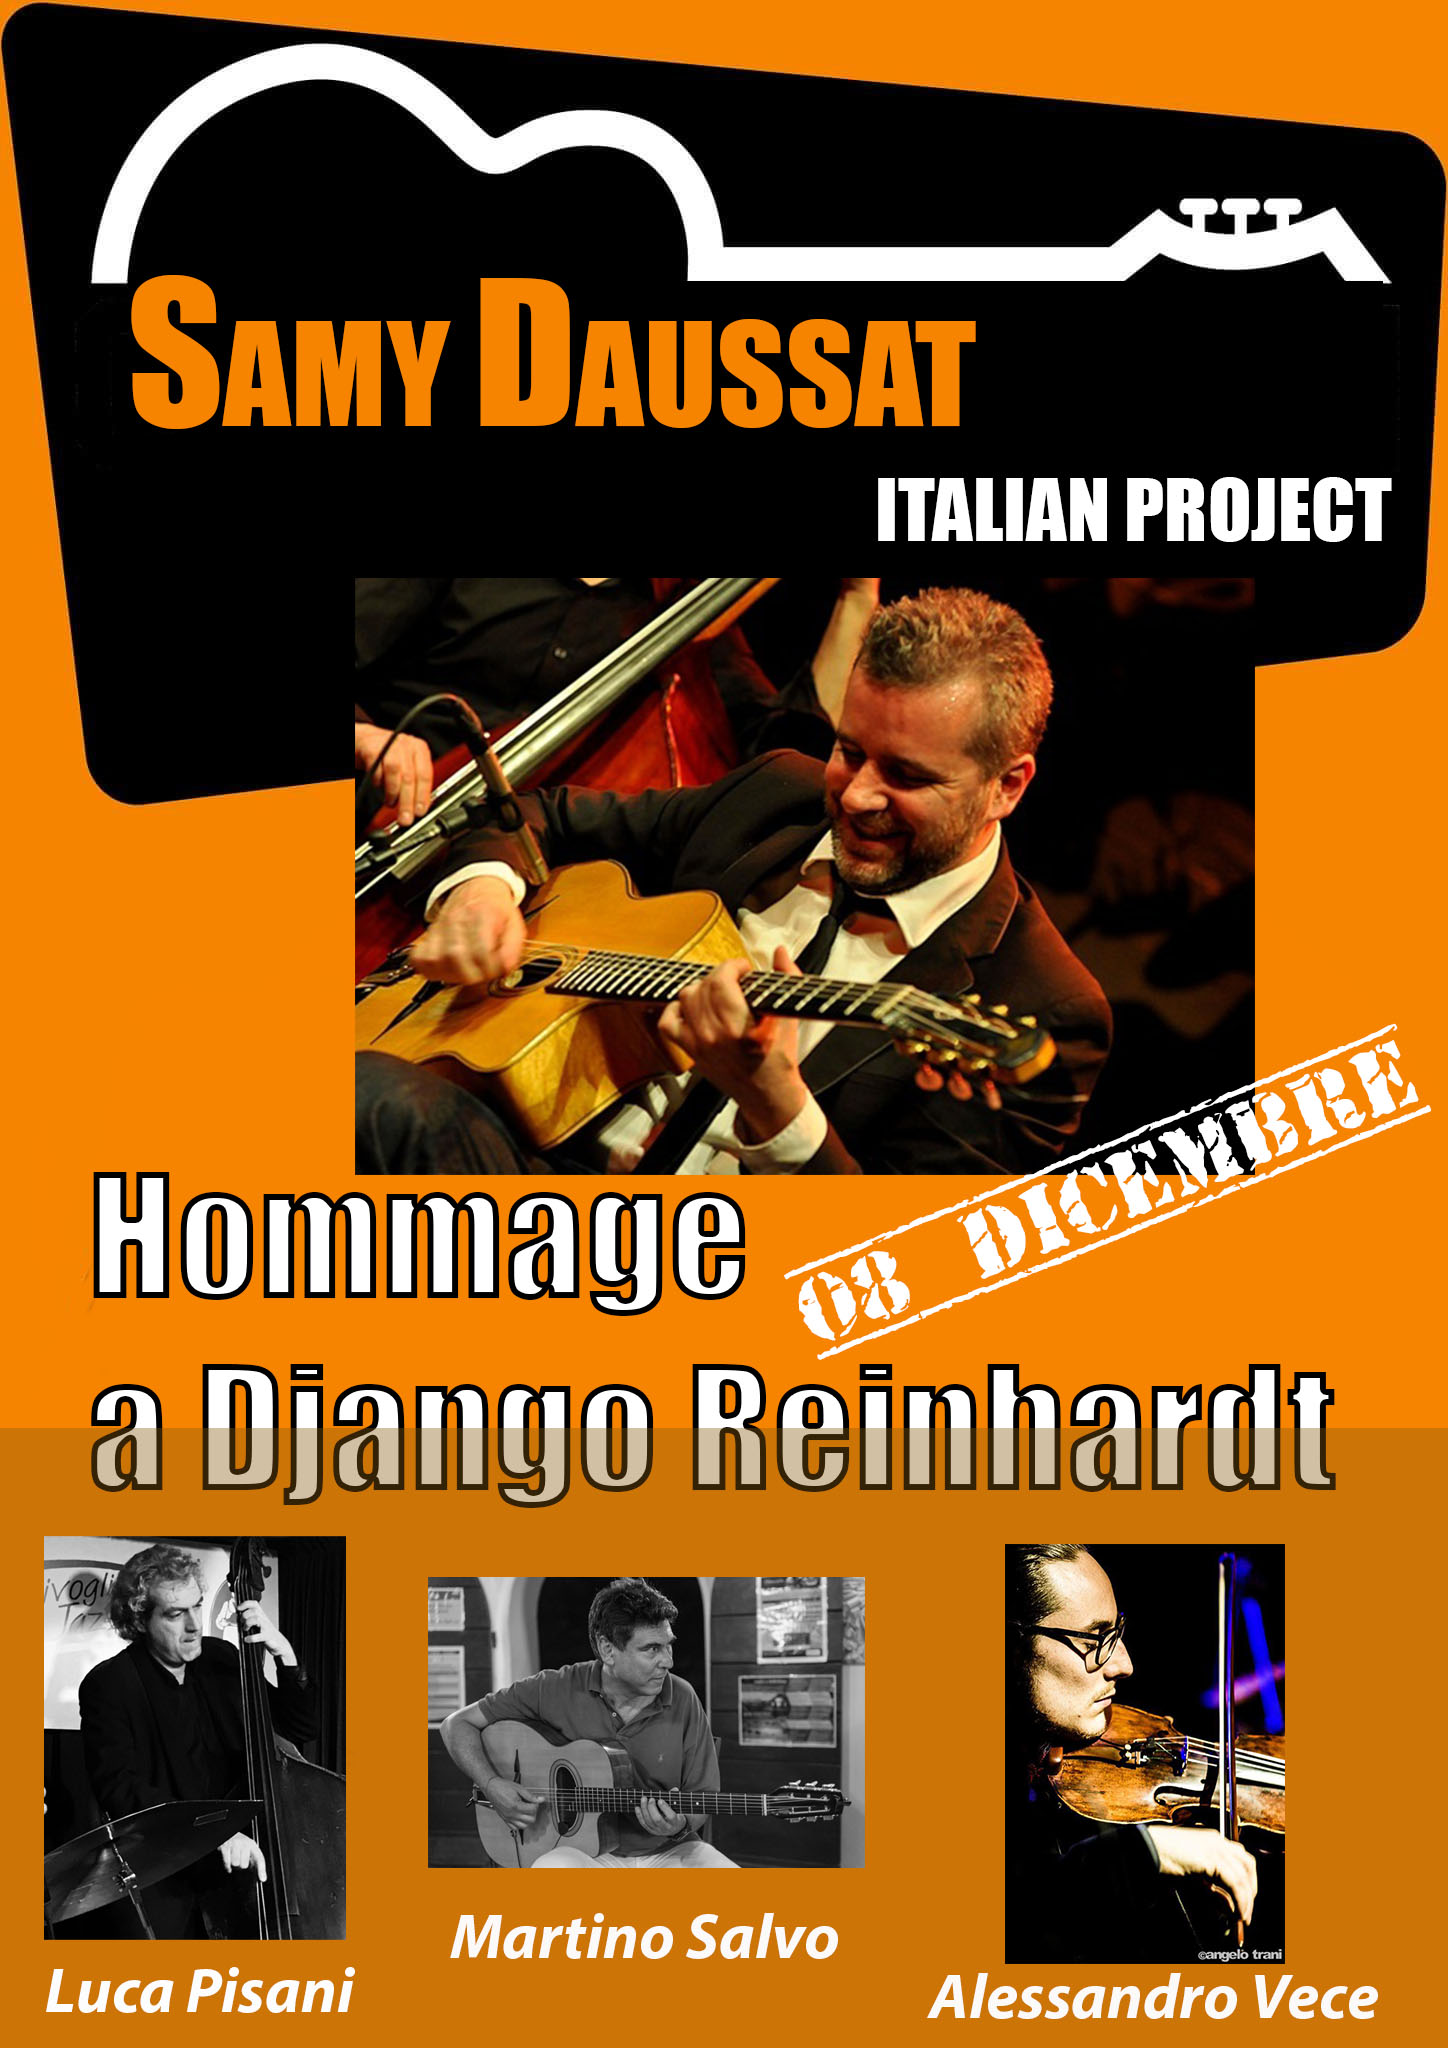 "SAMY DAUSSAT ITALIAN PROJECT ""Hommage a DjangoReinhardt"" (Gypsy jazz)"